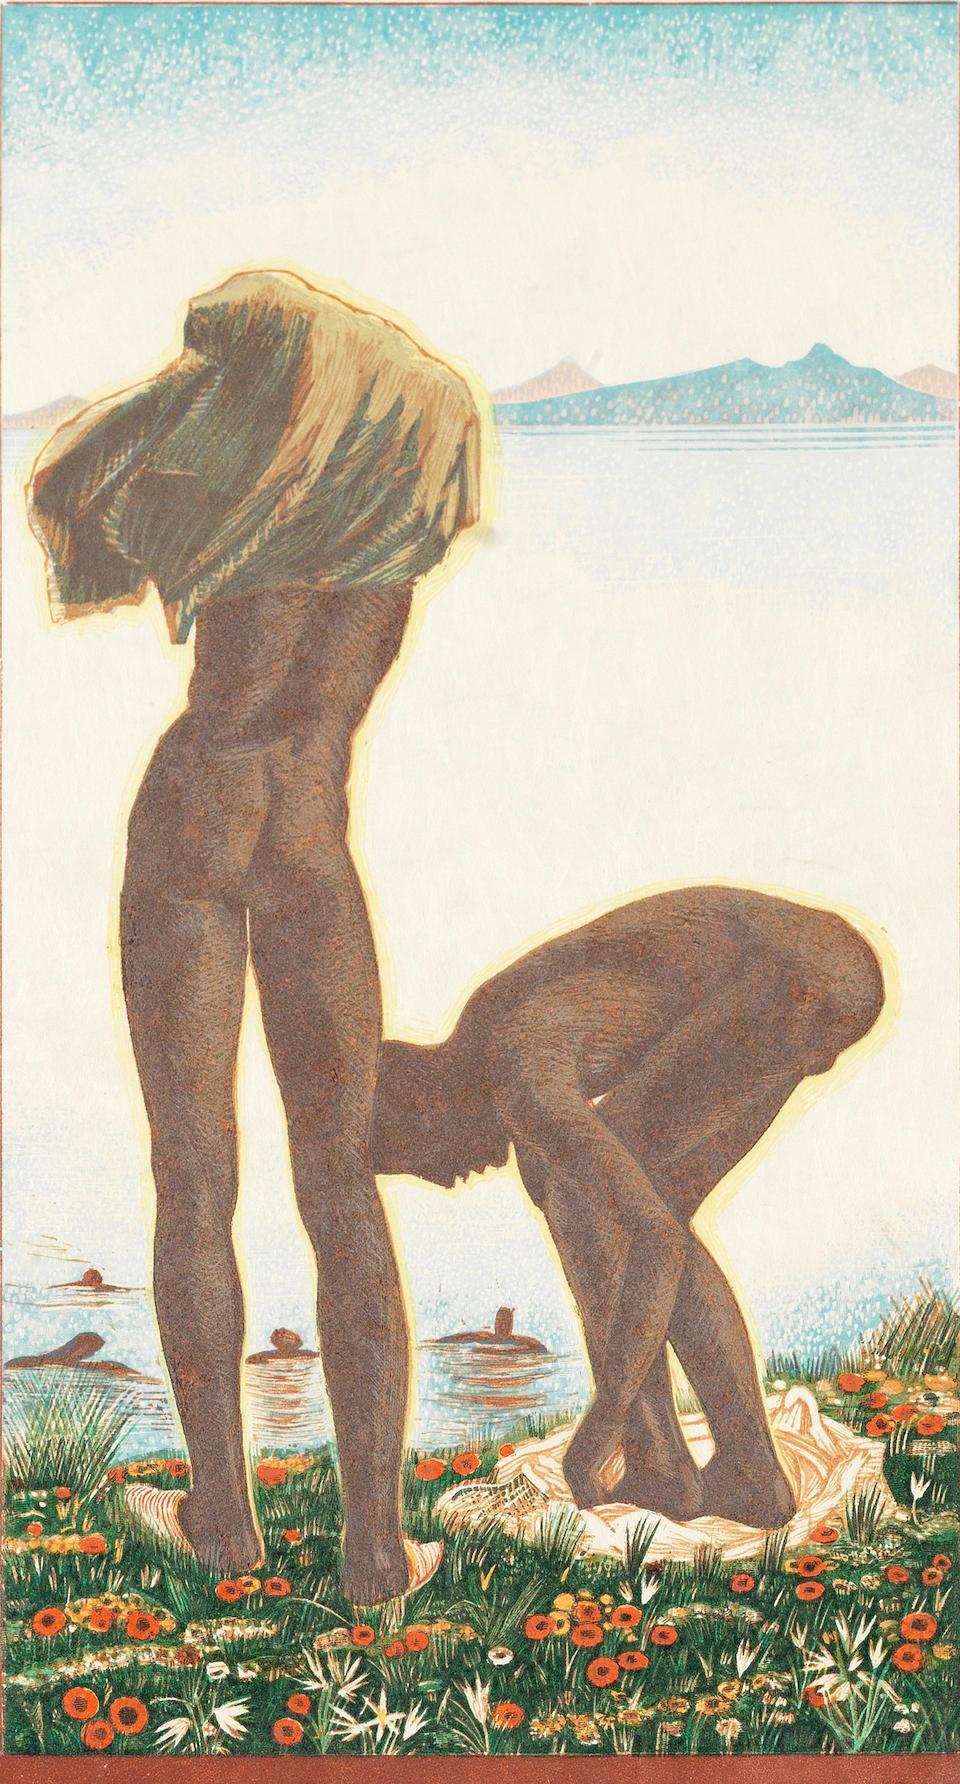 SCHMIED (THÉO, AND F.-L.) Sud-Marocain. Grand-Atlas, Anti-Atlas. Trente planches gravées sur bois en colours par Théo Schmied d'après les tableaux de son père F.-L. Schmied, NUMBER 71 OF 120 COPIES, WITH EACH PLATE SIGNED by the artist and engraver, and by Théo on the colophon, from an overall edition of 126 copies, Paris, Théo Schmied, 1936